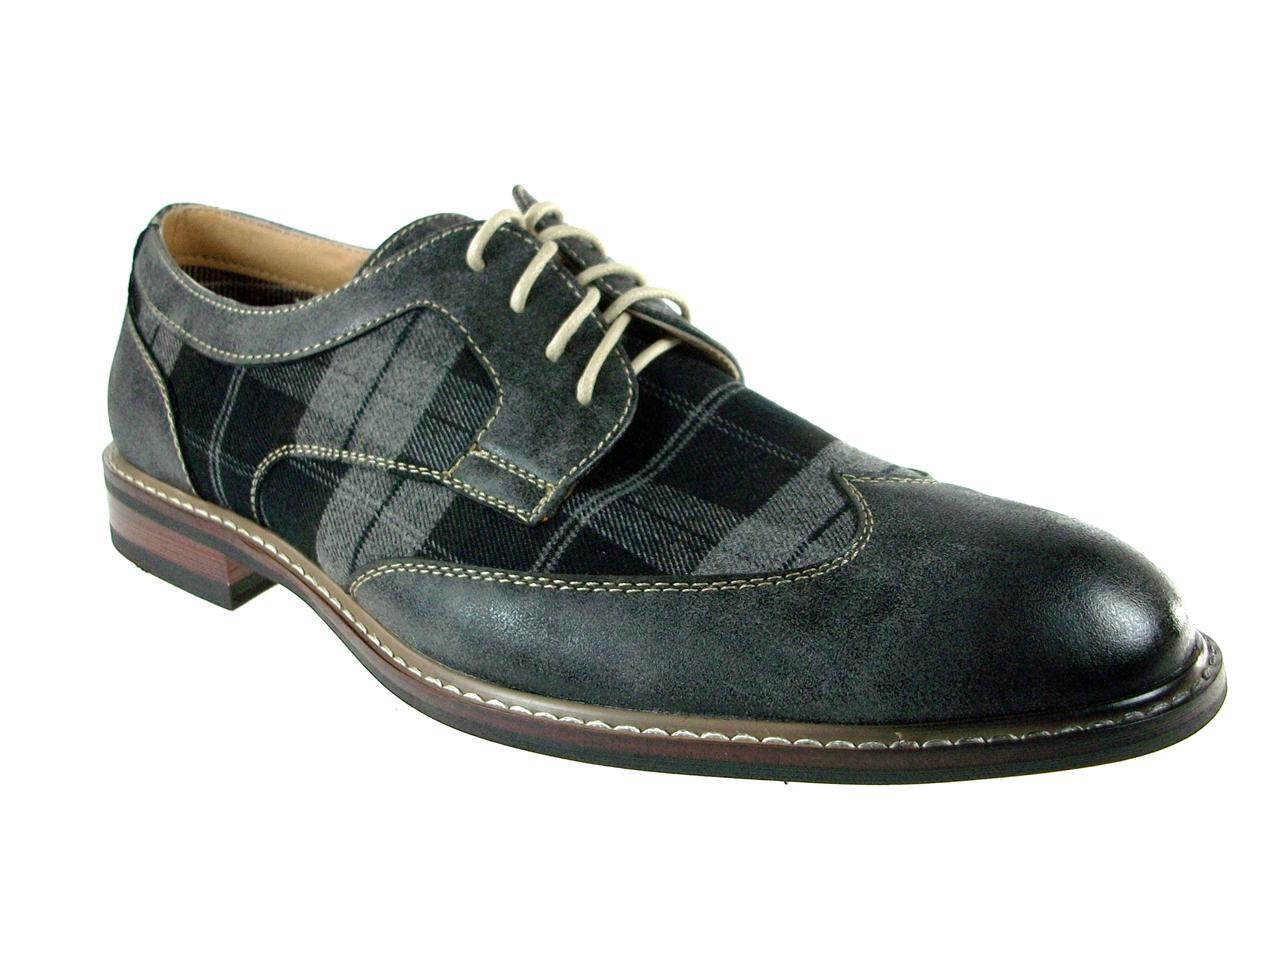 ferro aldo mens classic lace up oxford plaid dress shoes w